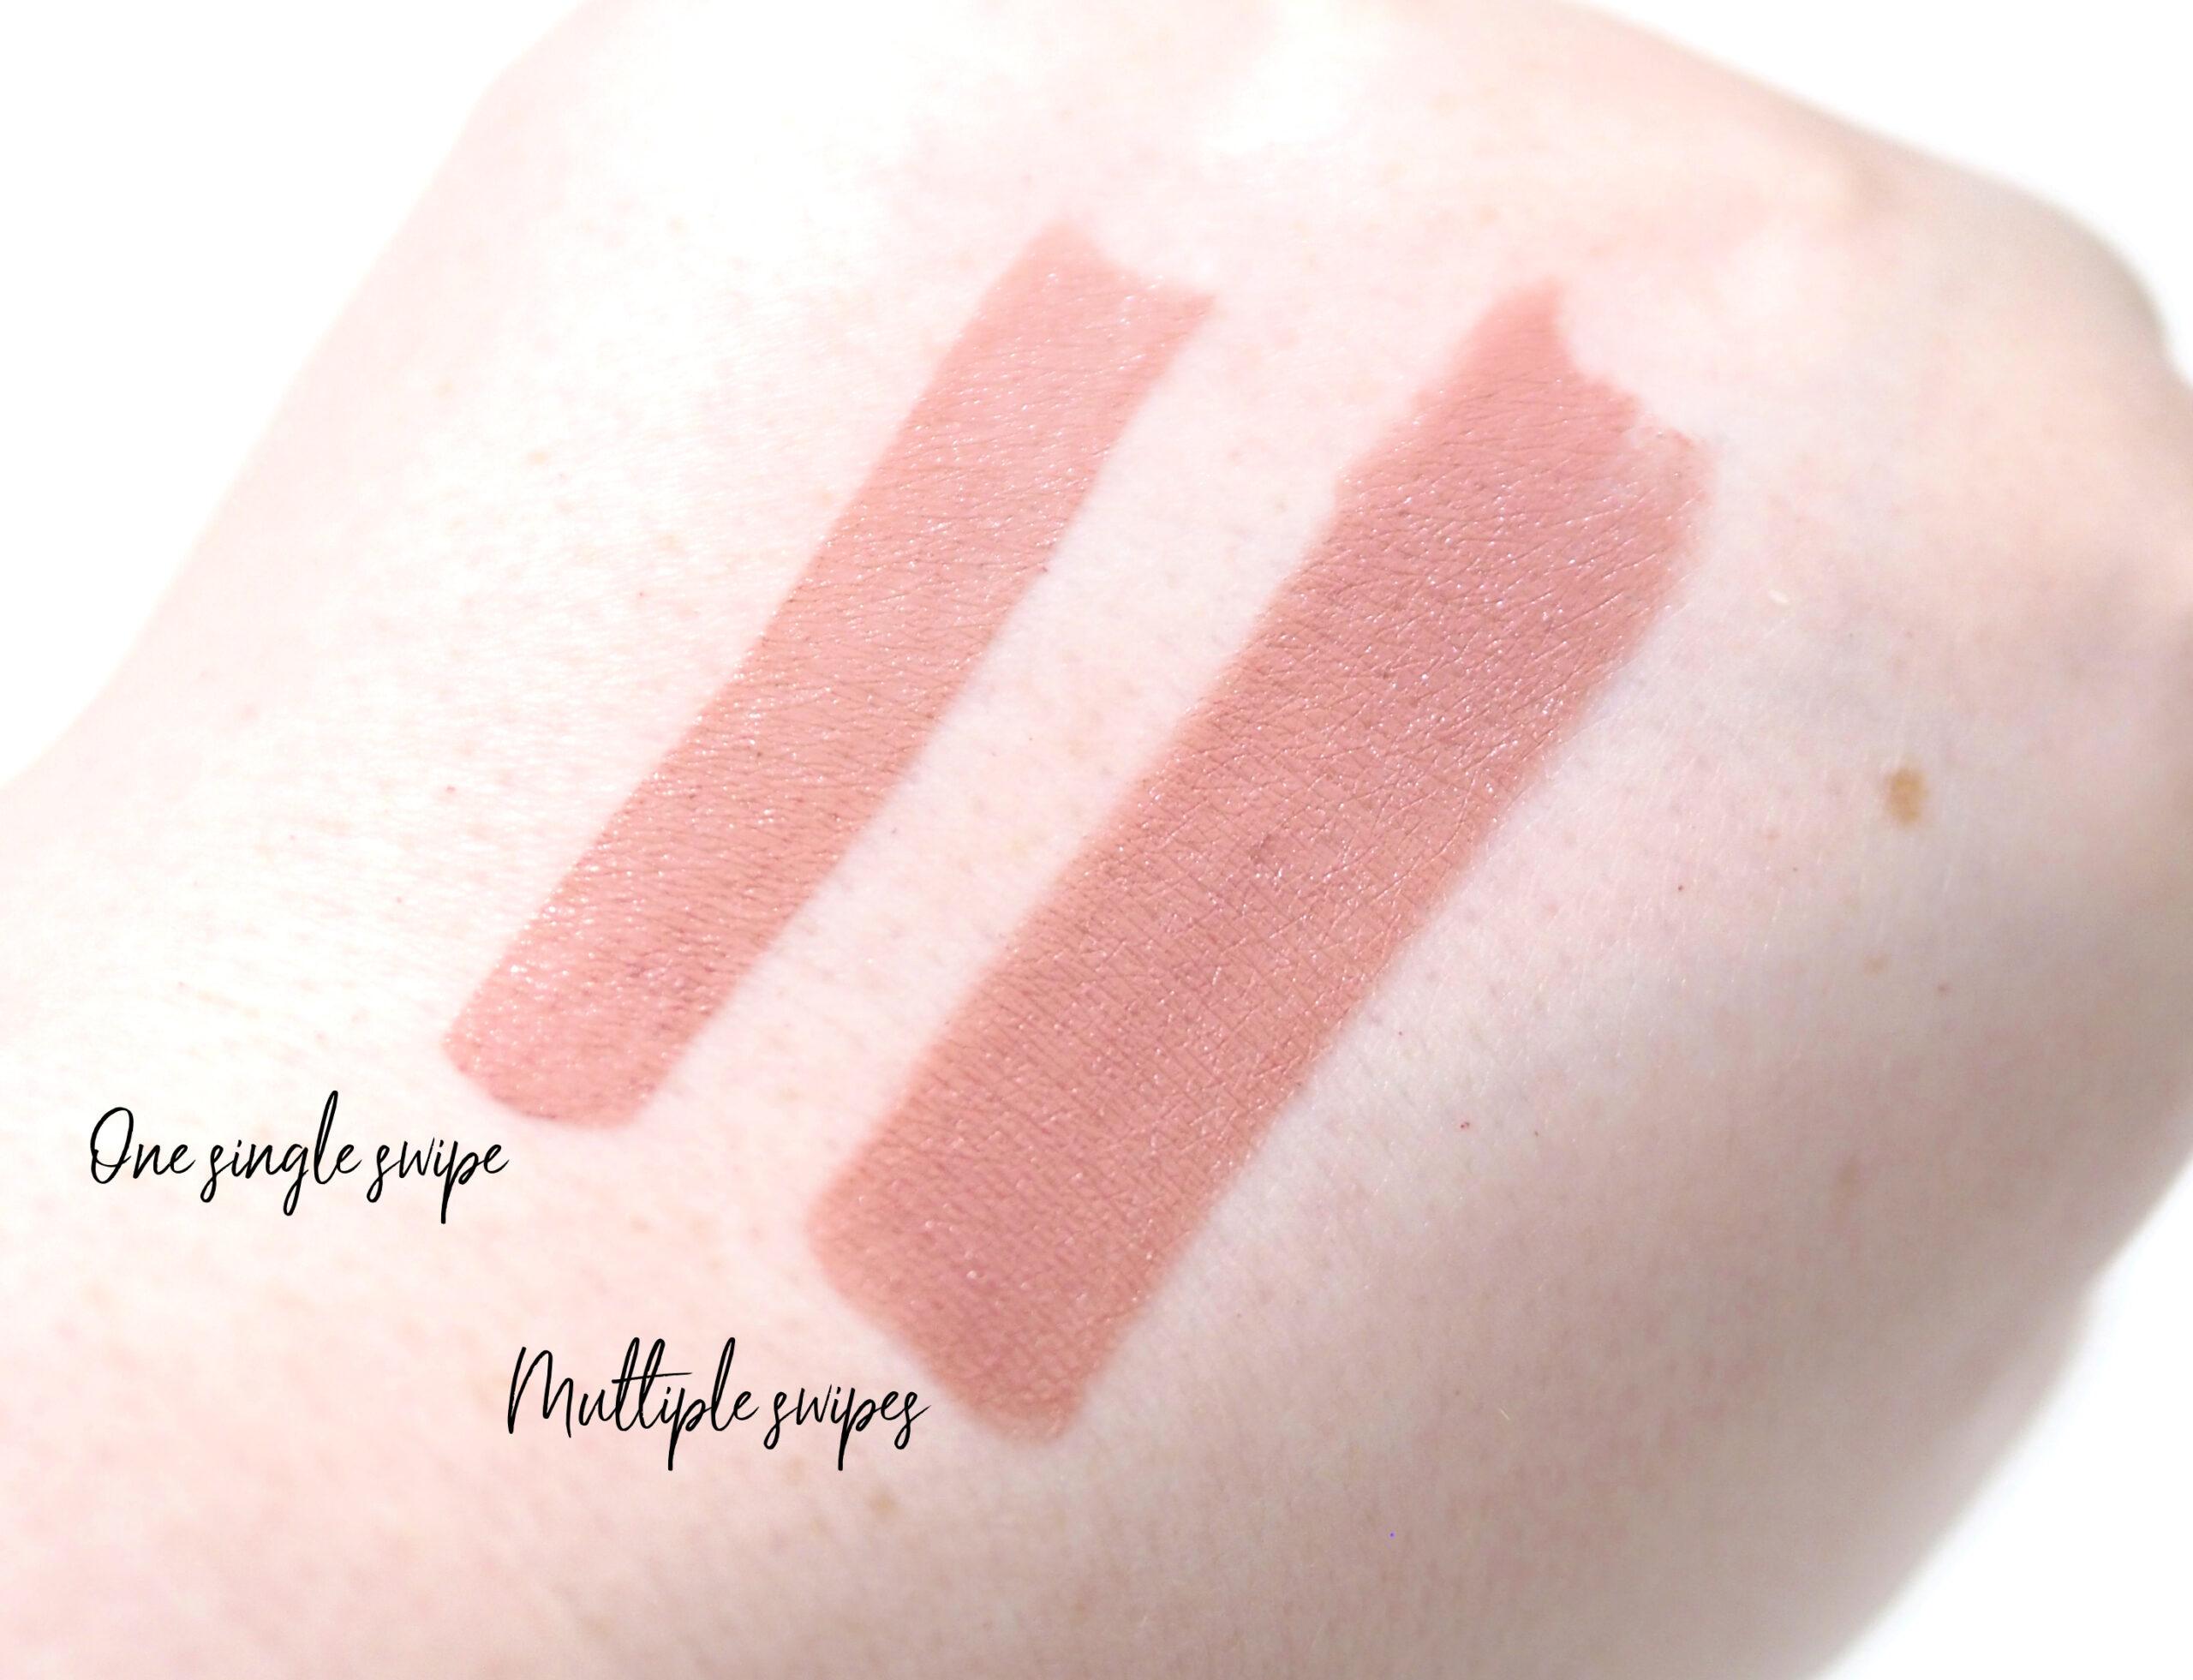 Revolution Pro Rockstar Hydrating Shine Lipstick Review / Swatches